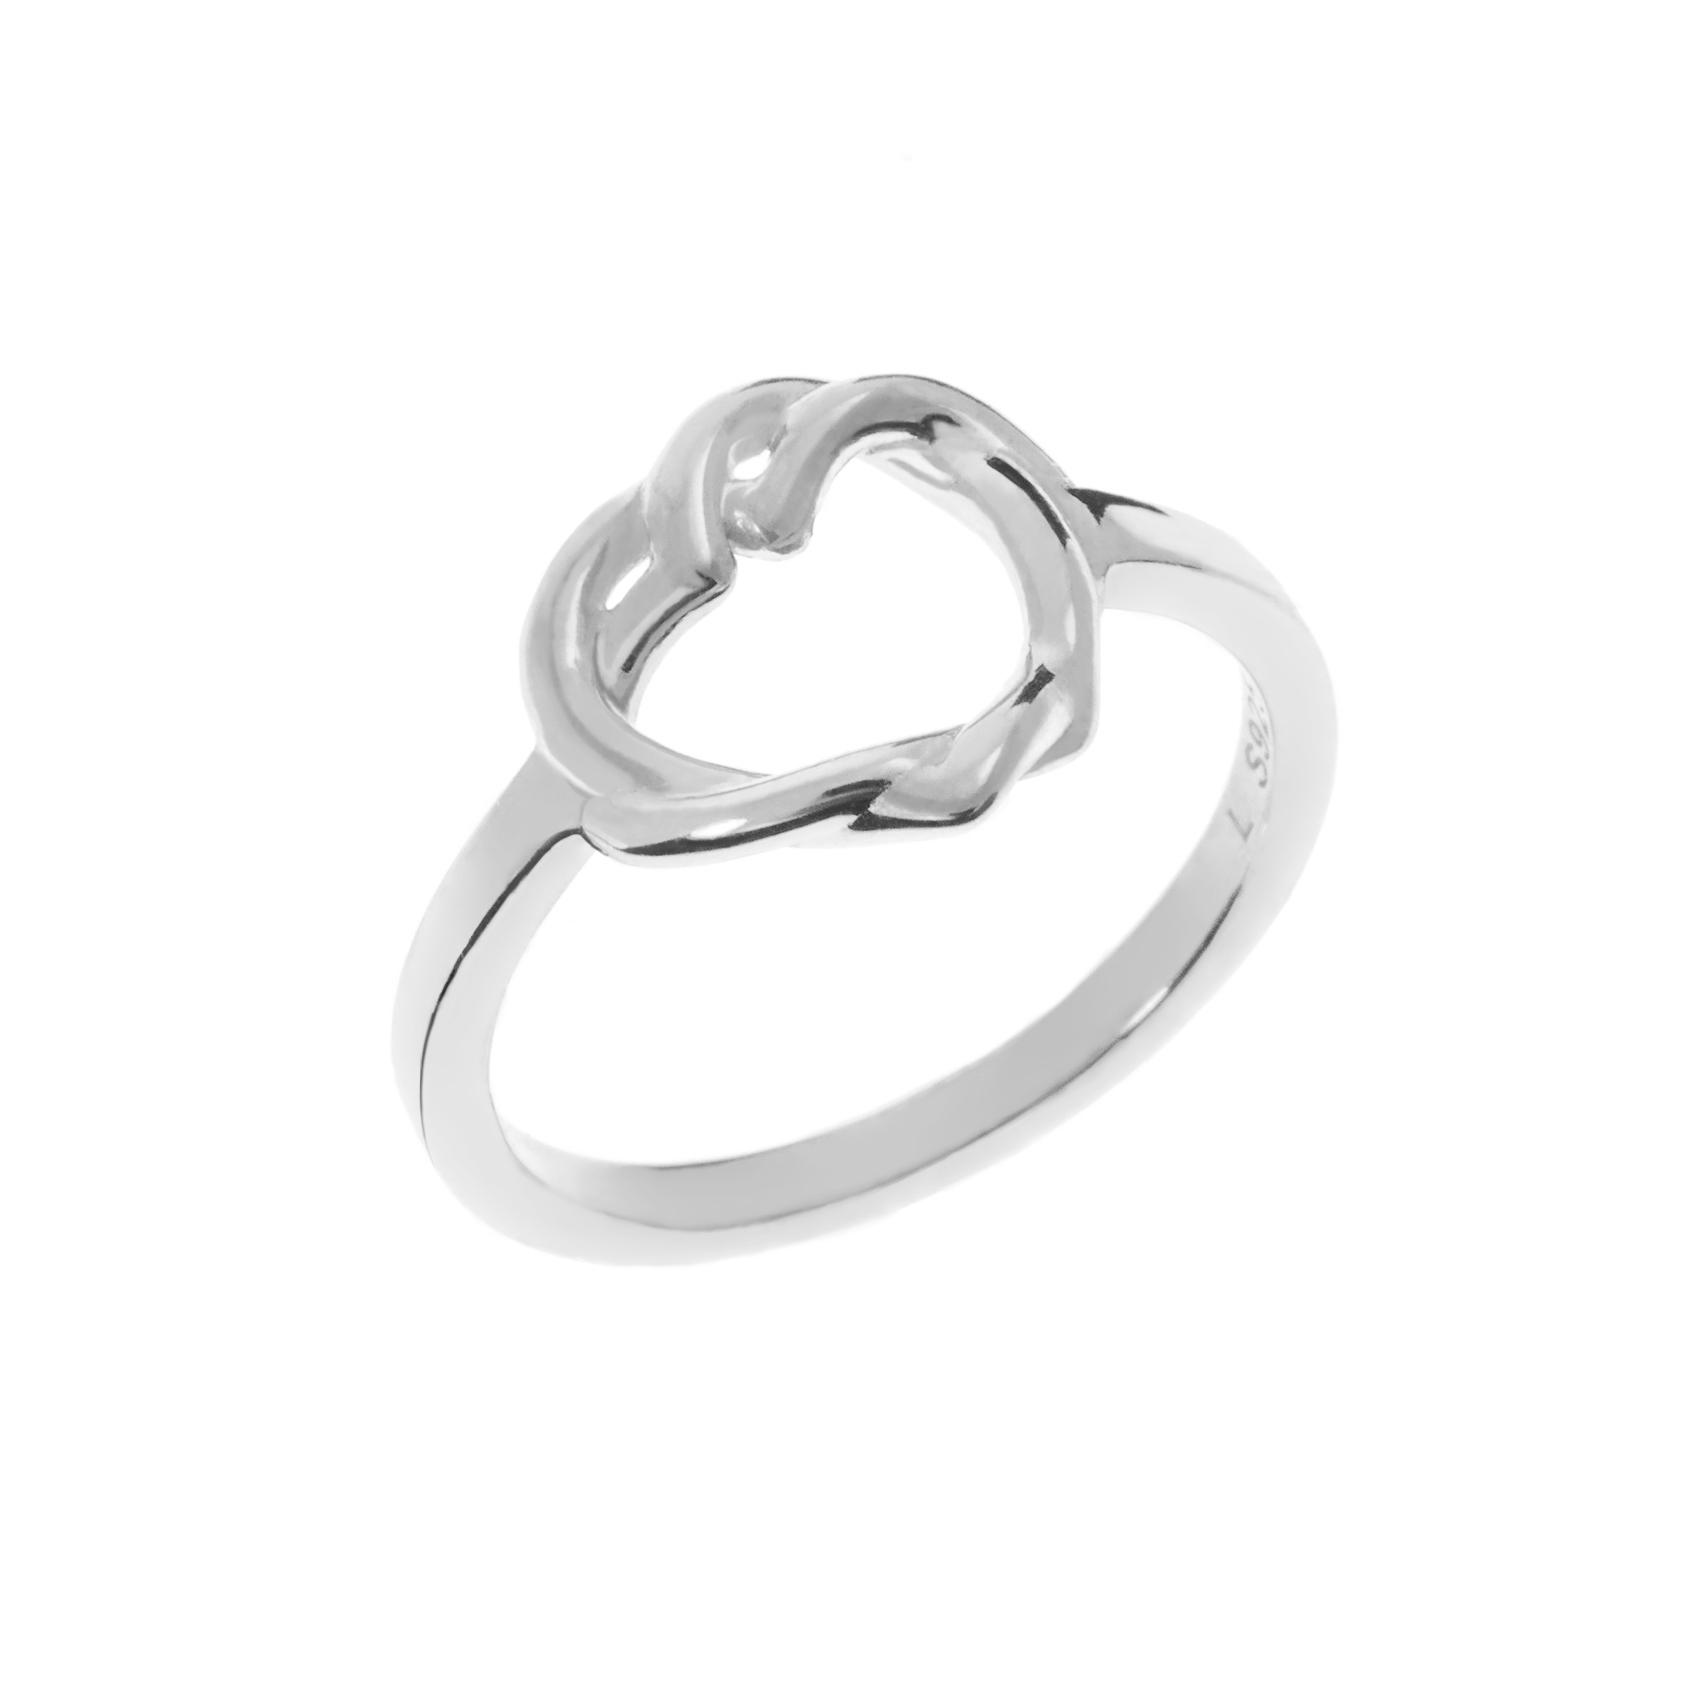 LINKS OF LONDON - Ασημένιο δαχτυλίδι Kindred Soul γυναικεία αξεσουάρ κοσμήματα δαχτυλίδια